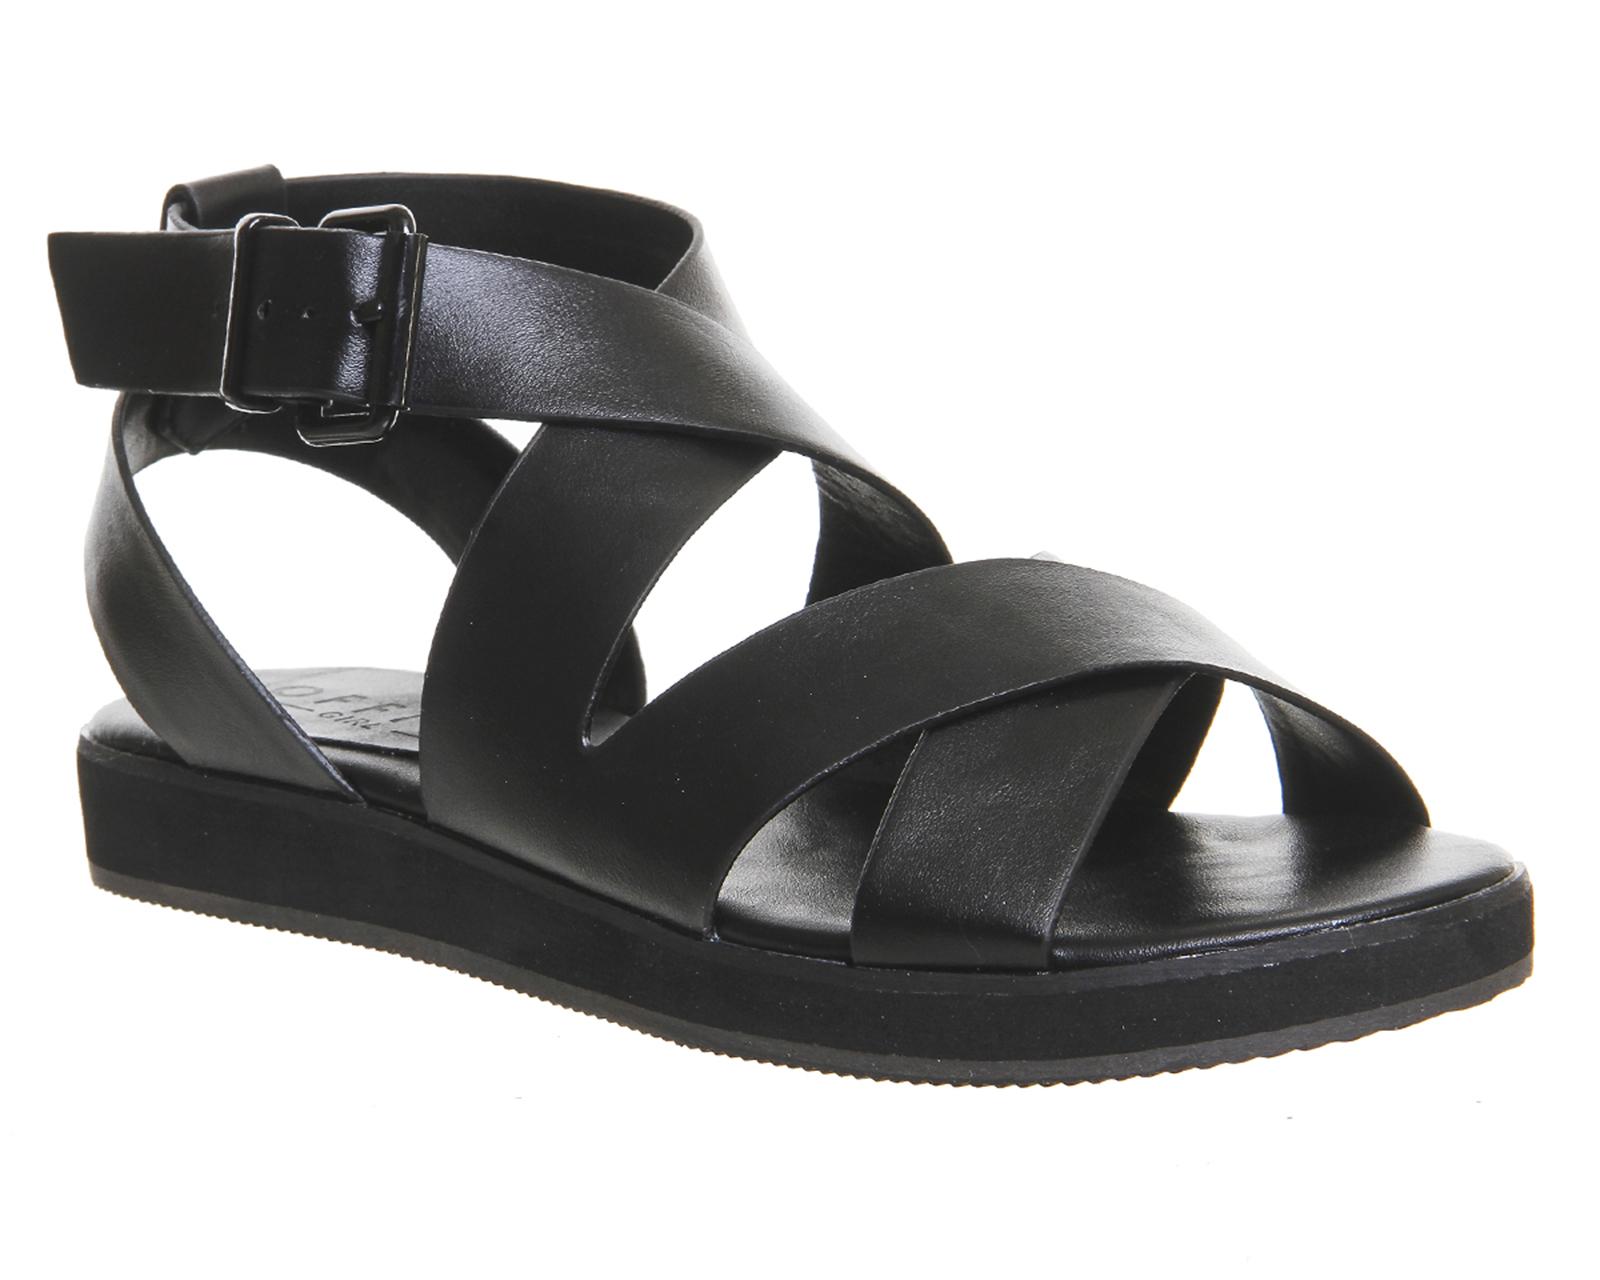 Sandals in black - Womens Office Bounce Sporty Sandal Black Sandals